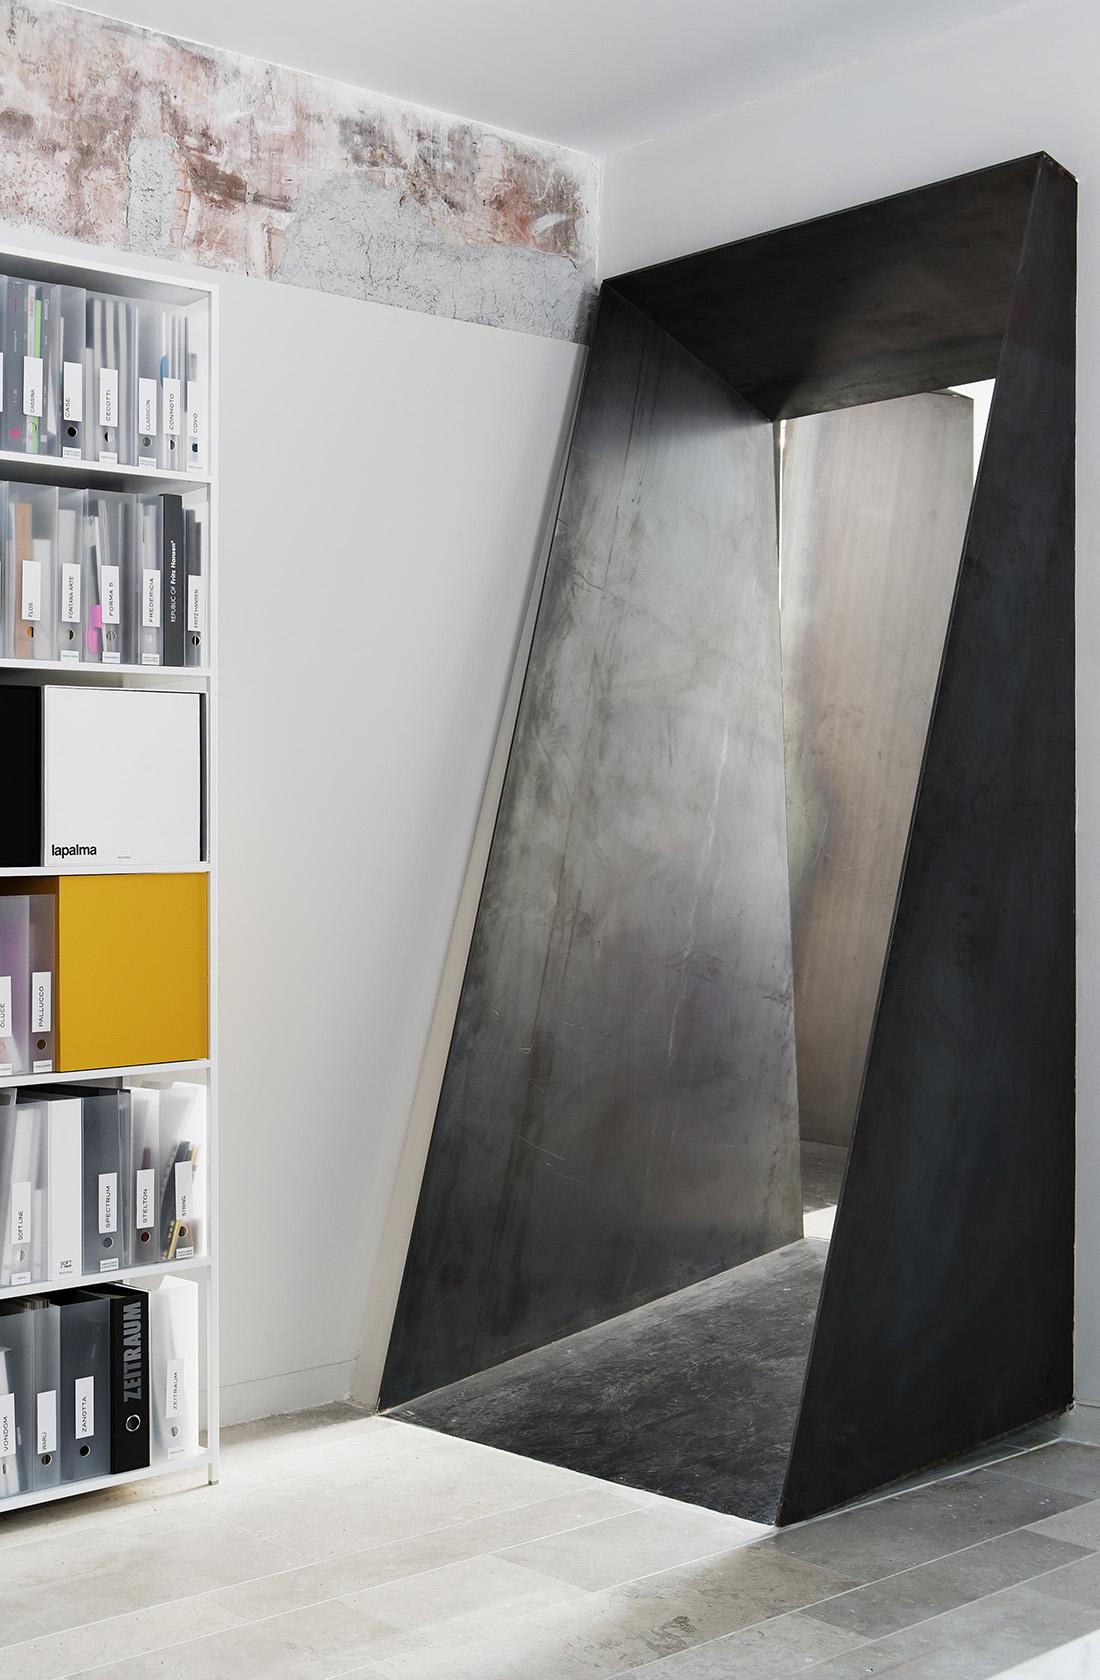 Vista de la embocadura de acero que conecta espacios del showroom de BATAVIA